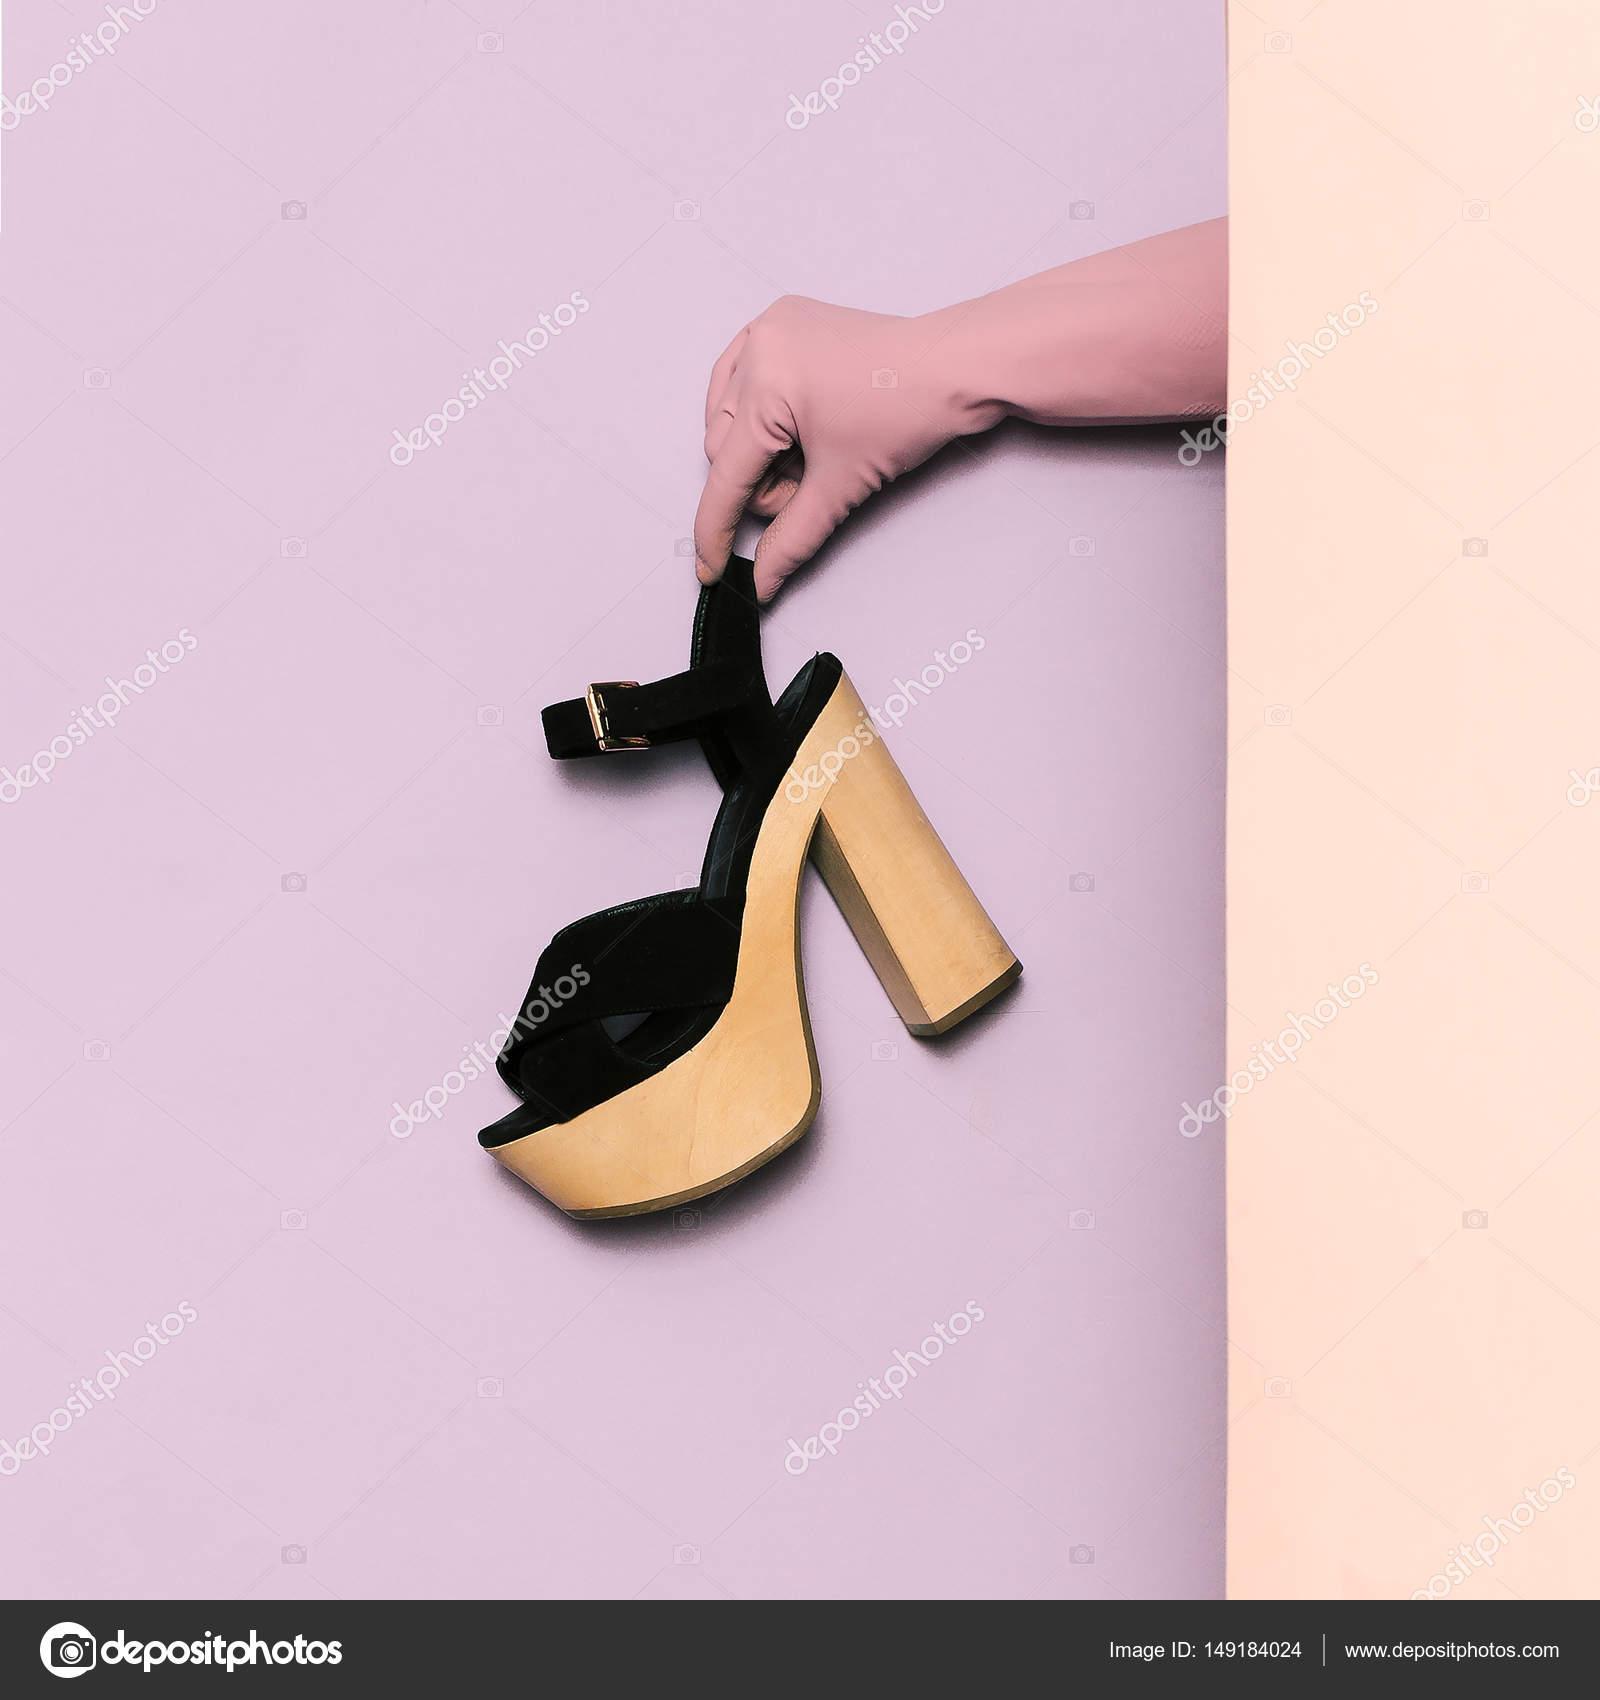 vetements elegants chaussures a talons chaussures glamours ide de garde robe